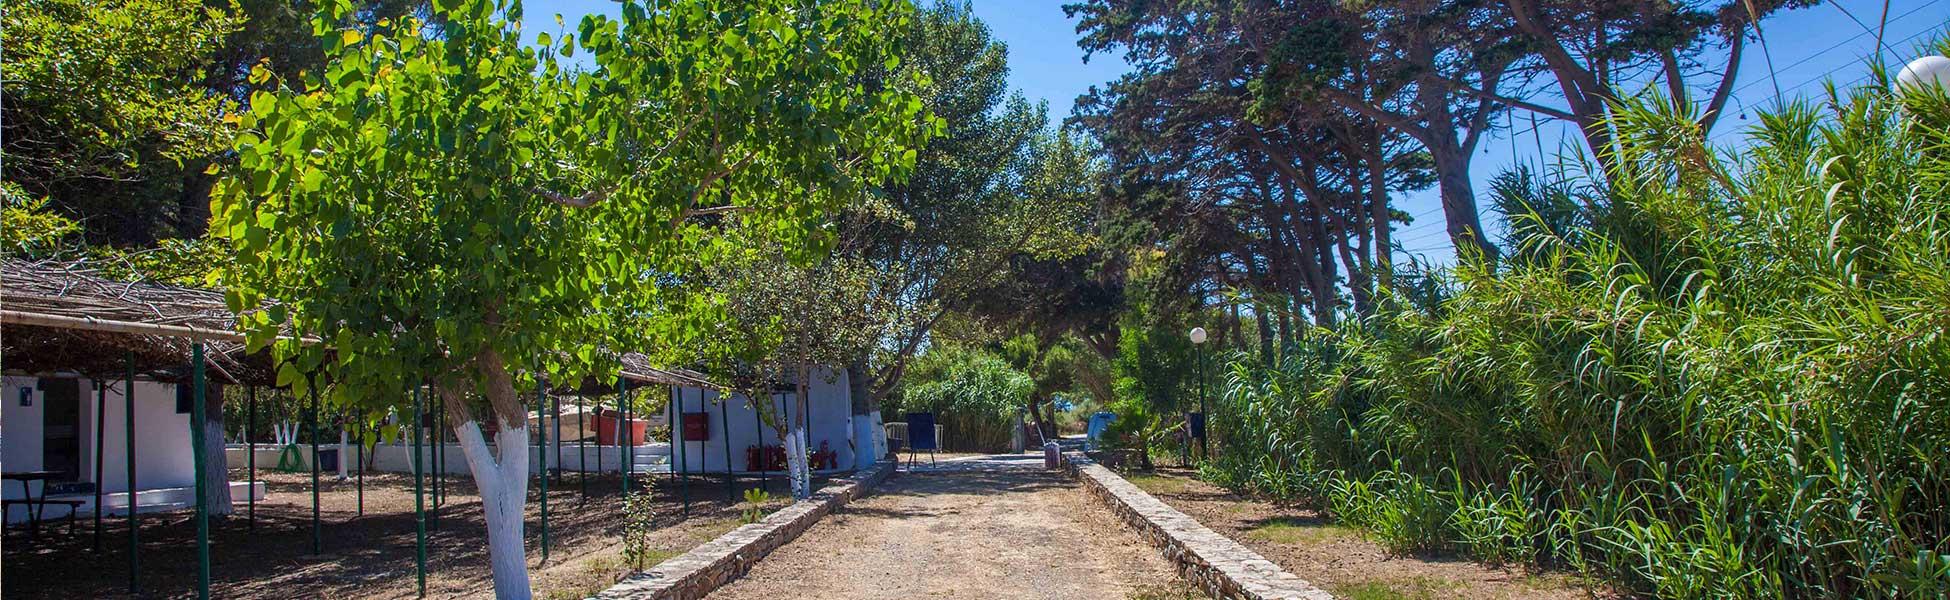 Facilities-Municipal-Camping-Katapola-Amorgos-Cyclades-Greece